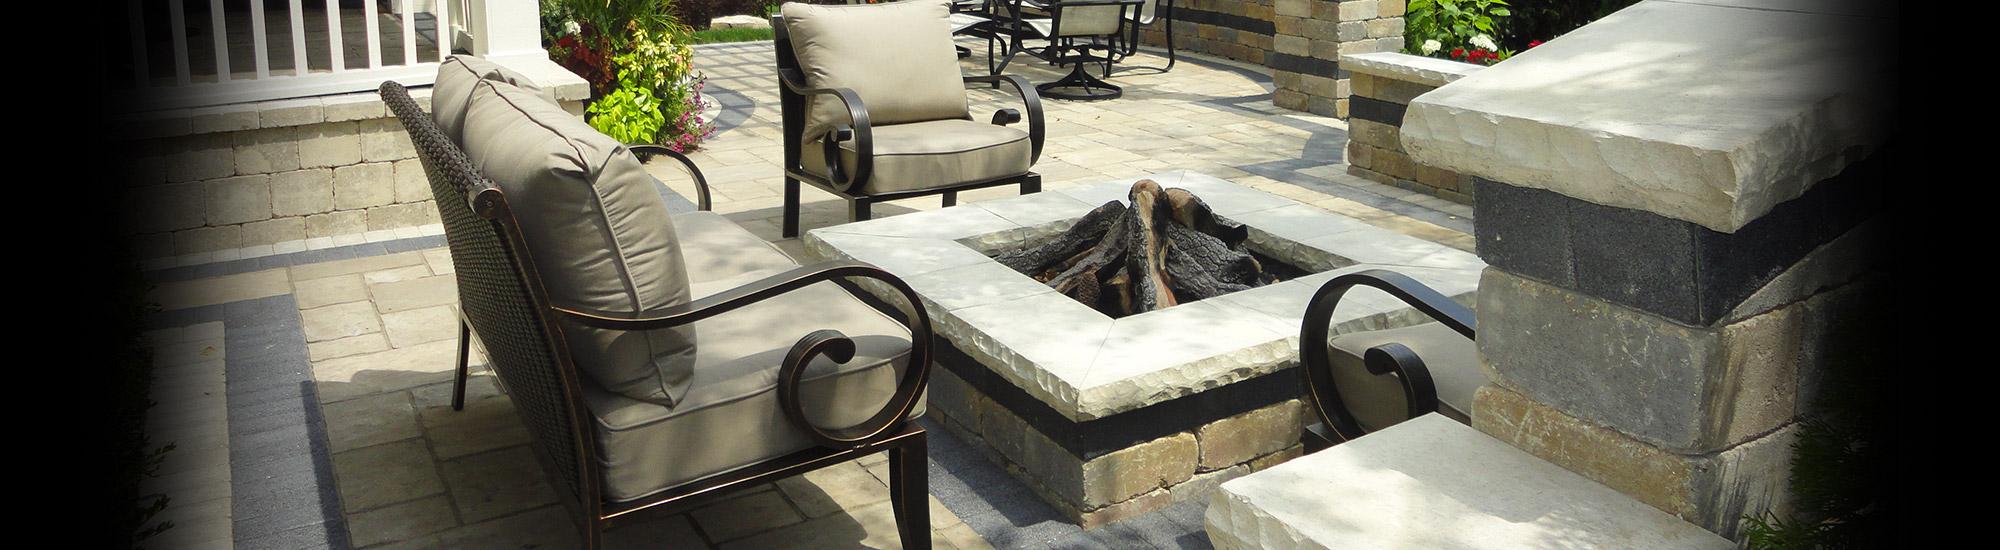 brick paver fire pit glenview